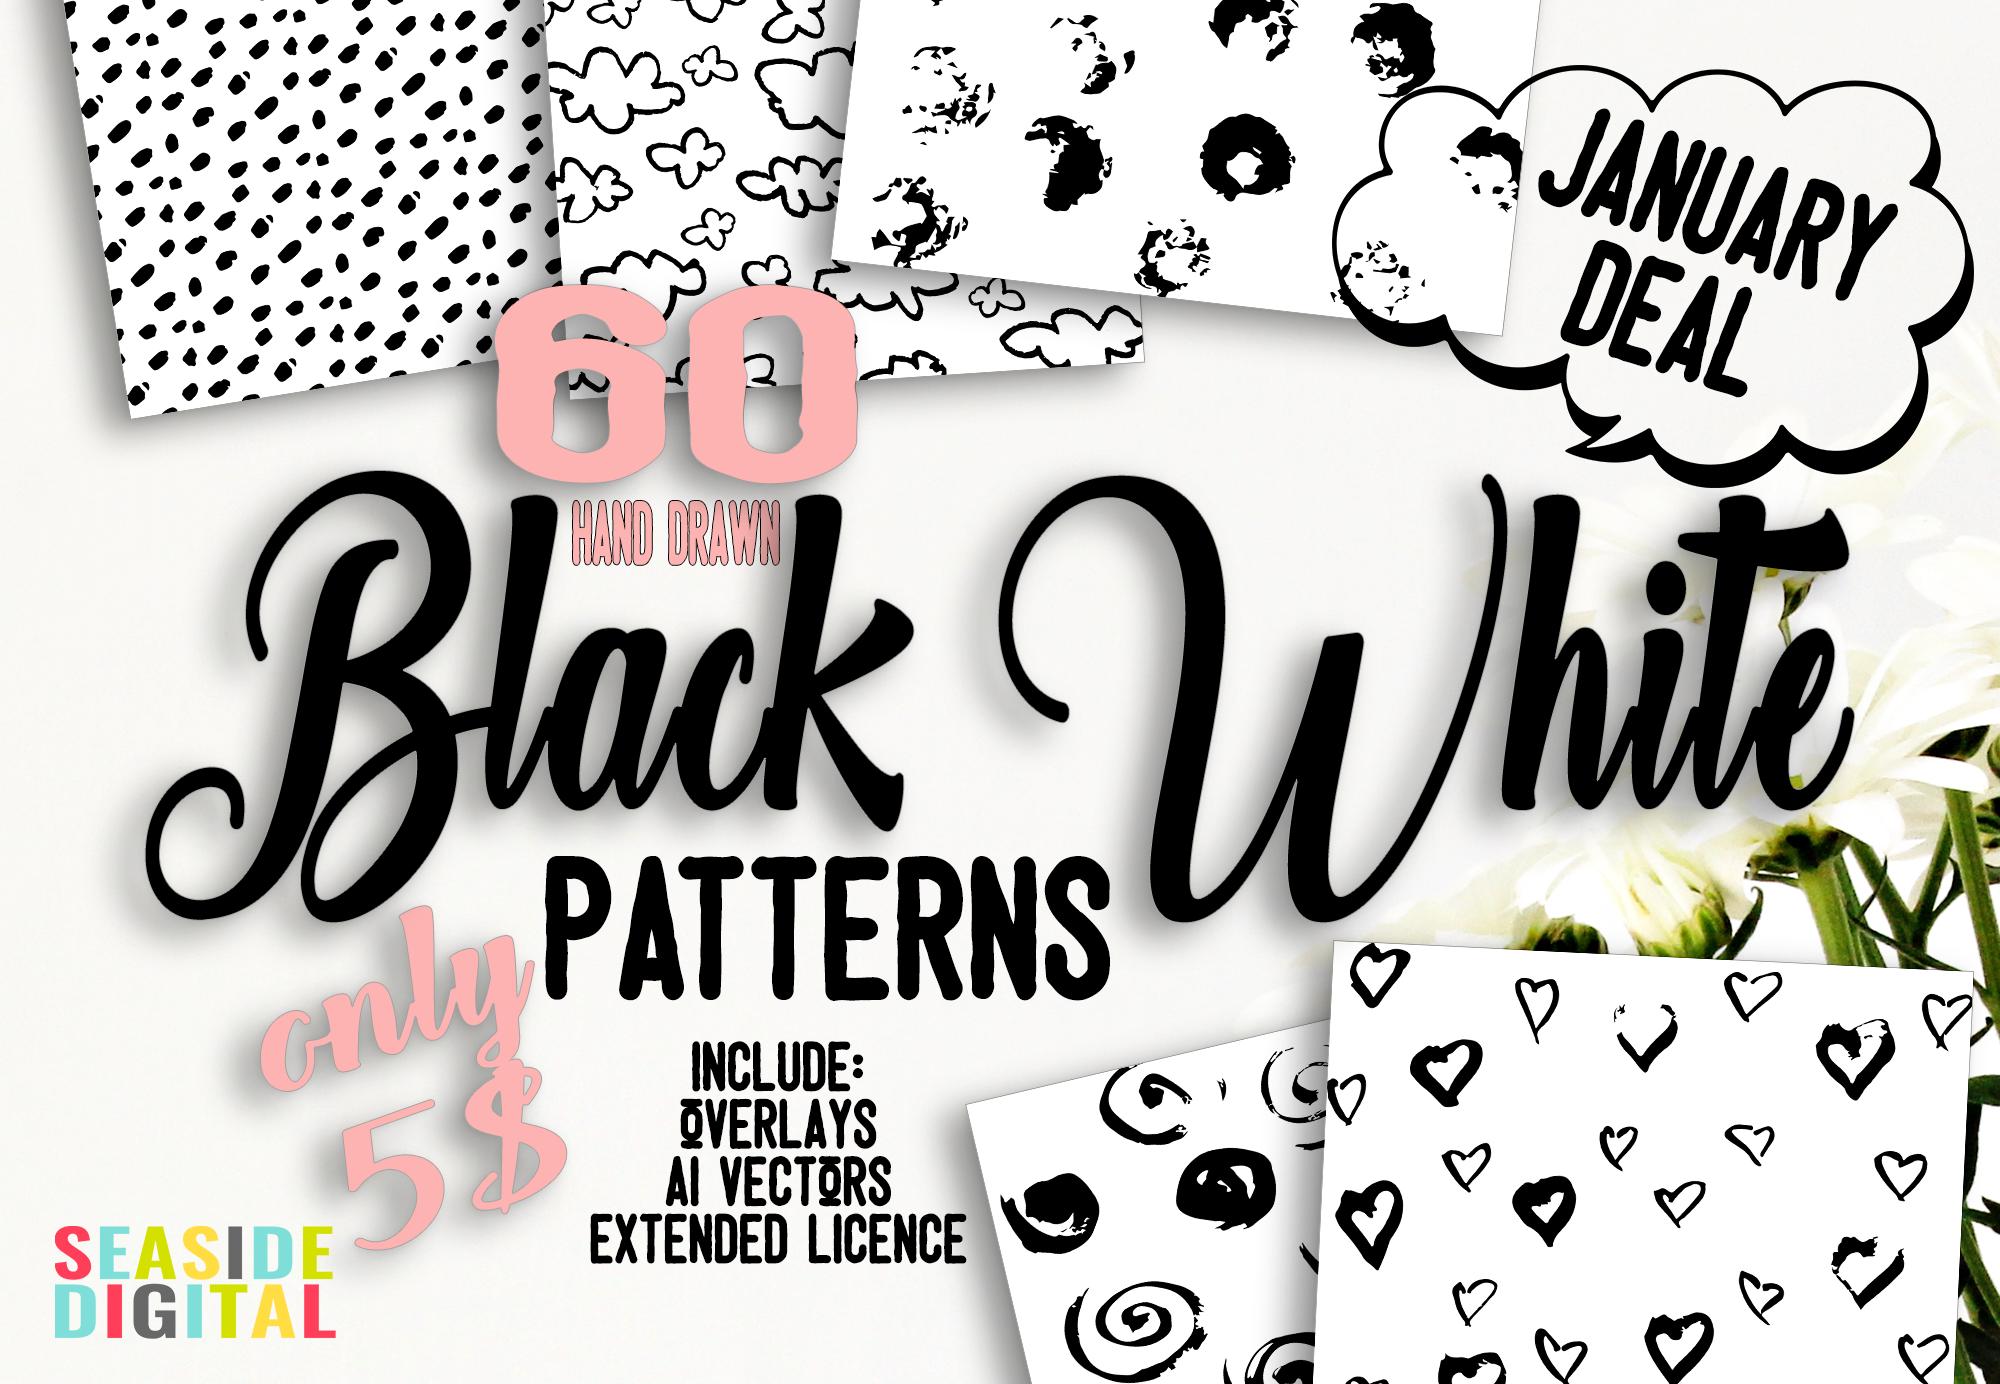 60 Black and White Patterns Bundle example image 1